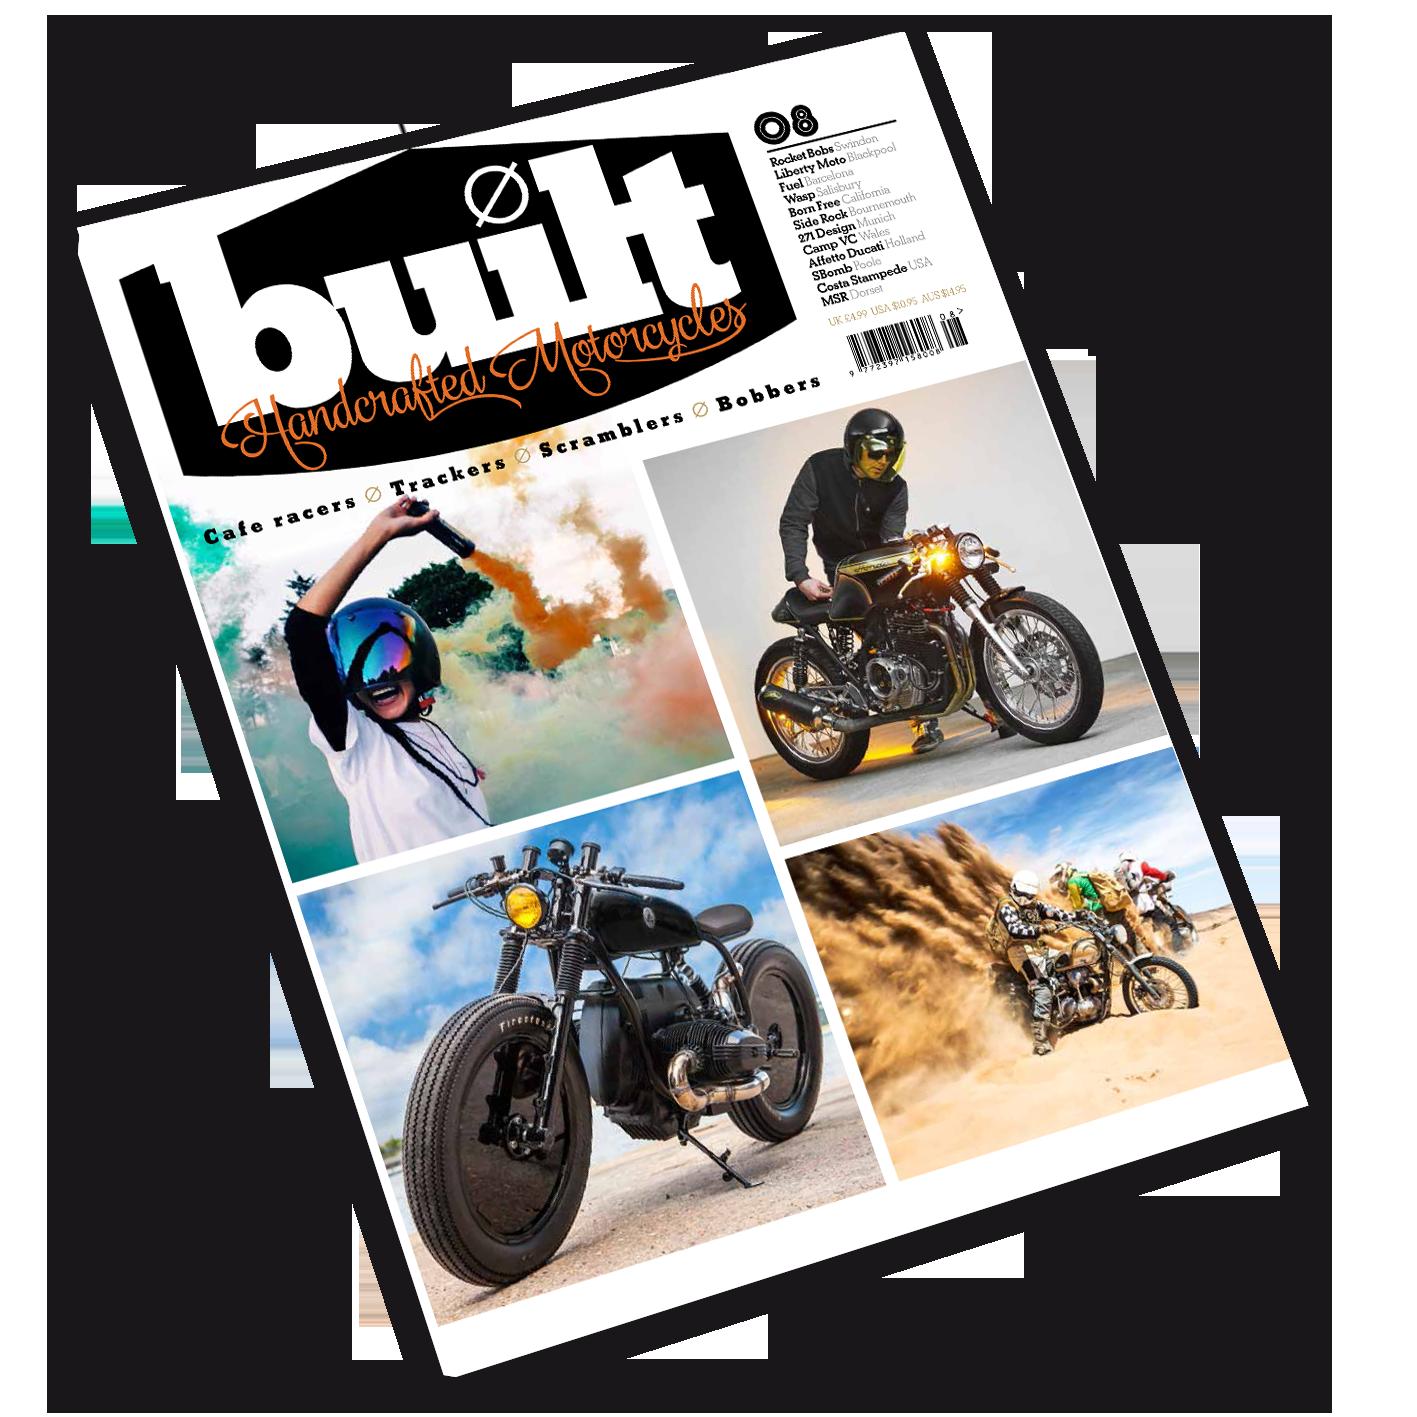 Built magazine issue 8